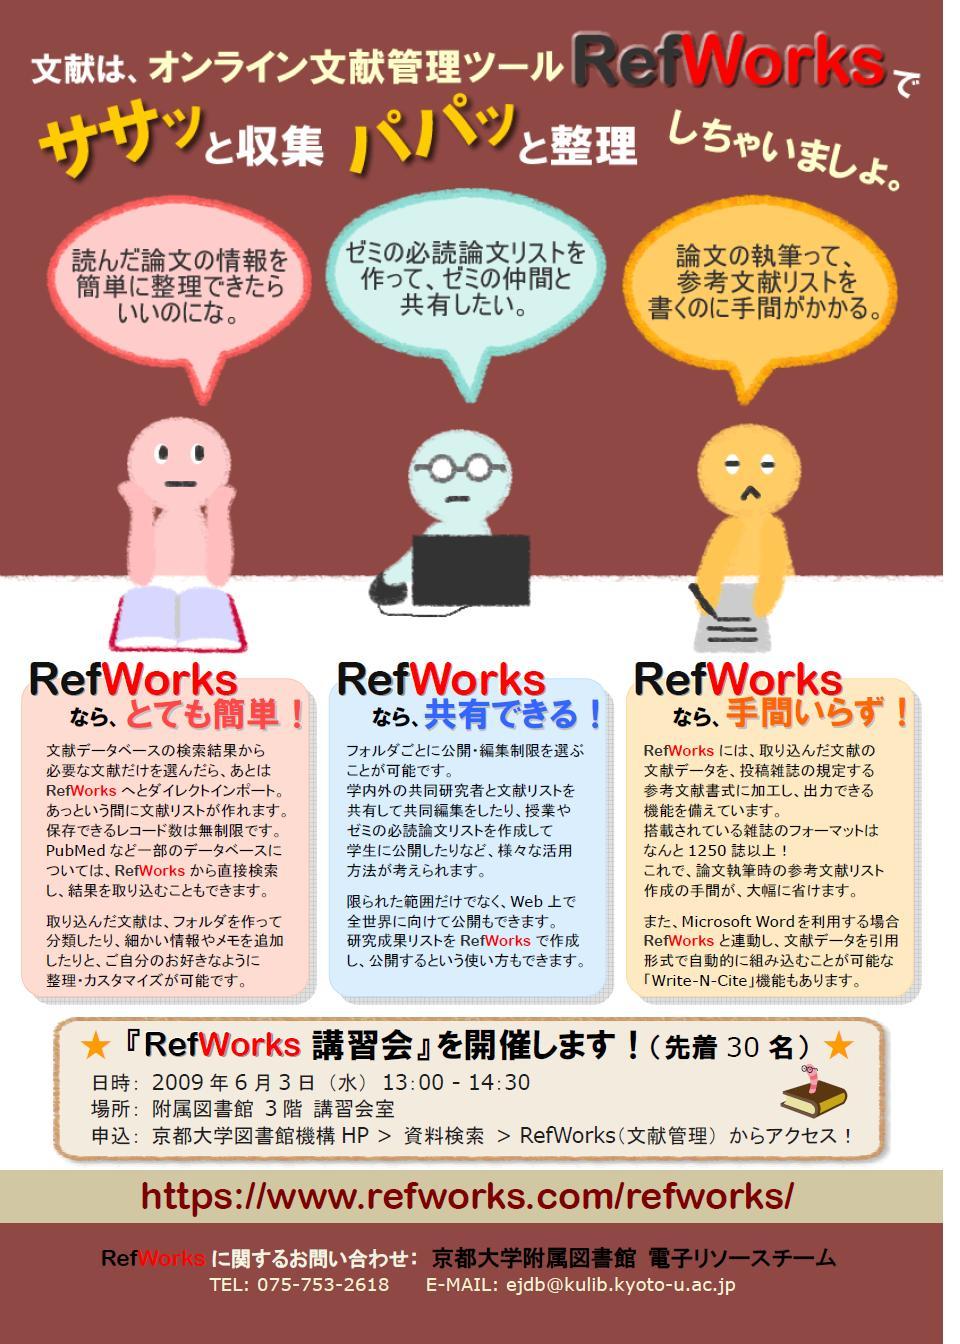 RefWorks200905ポスター